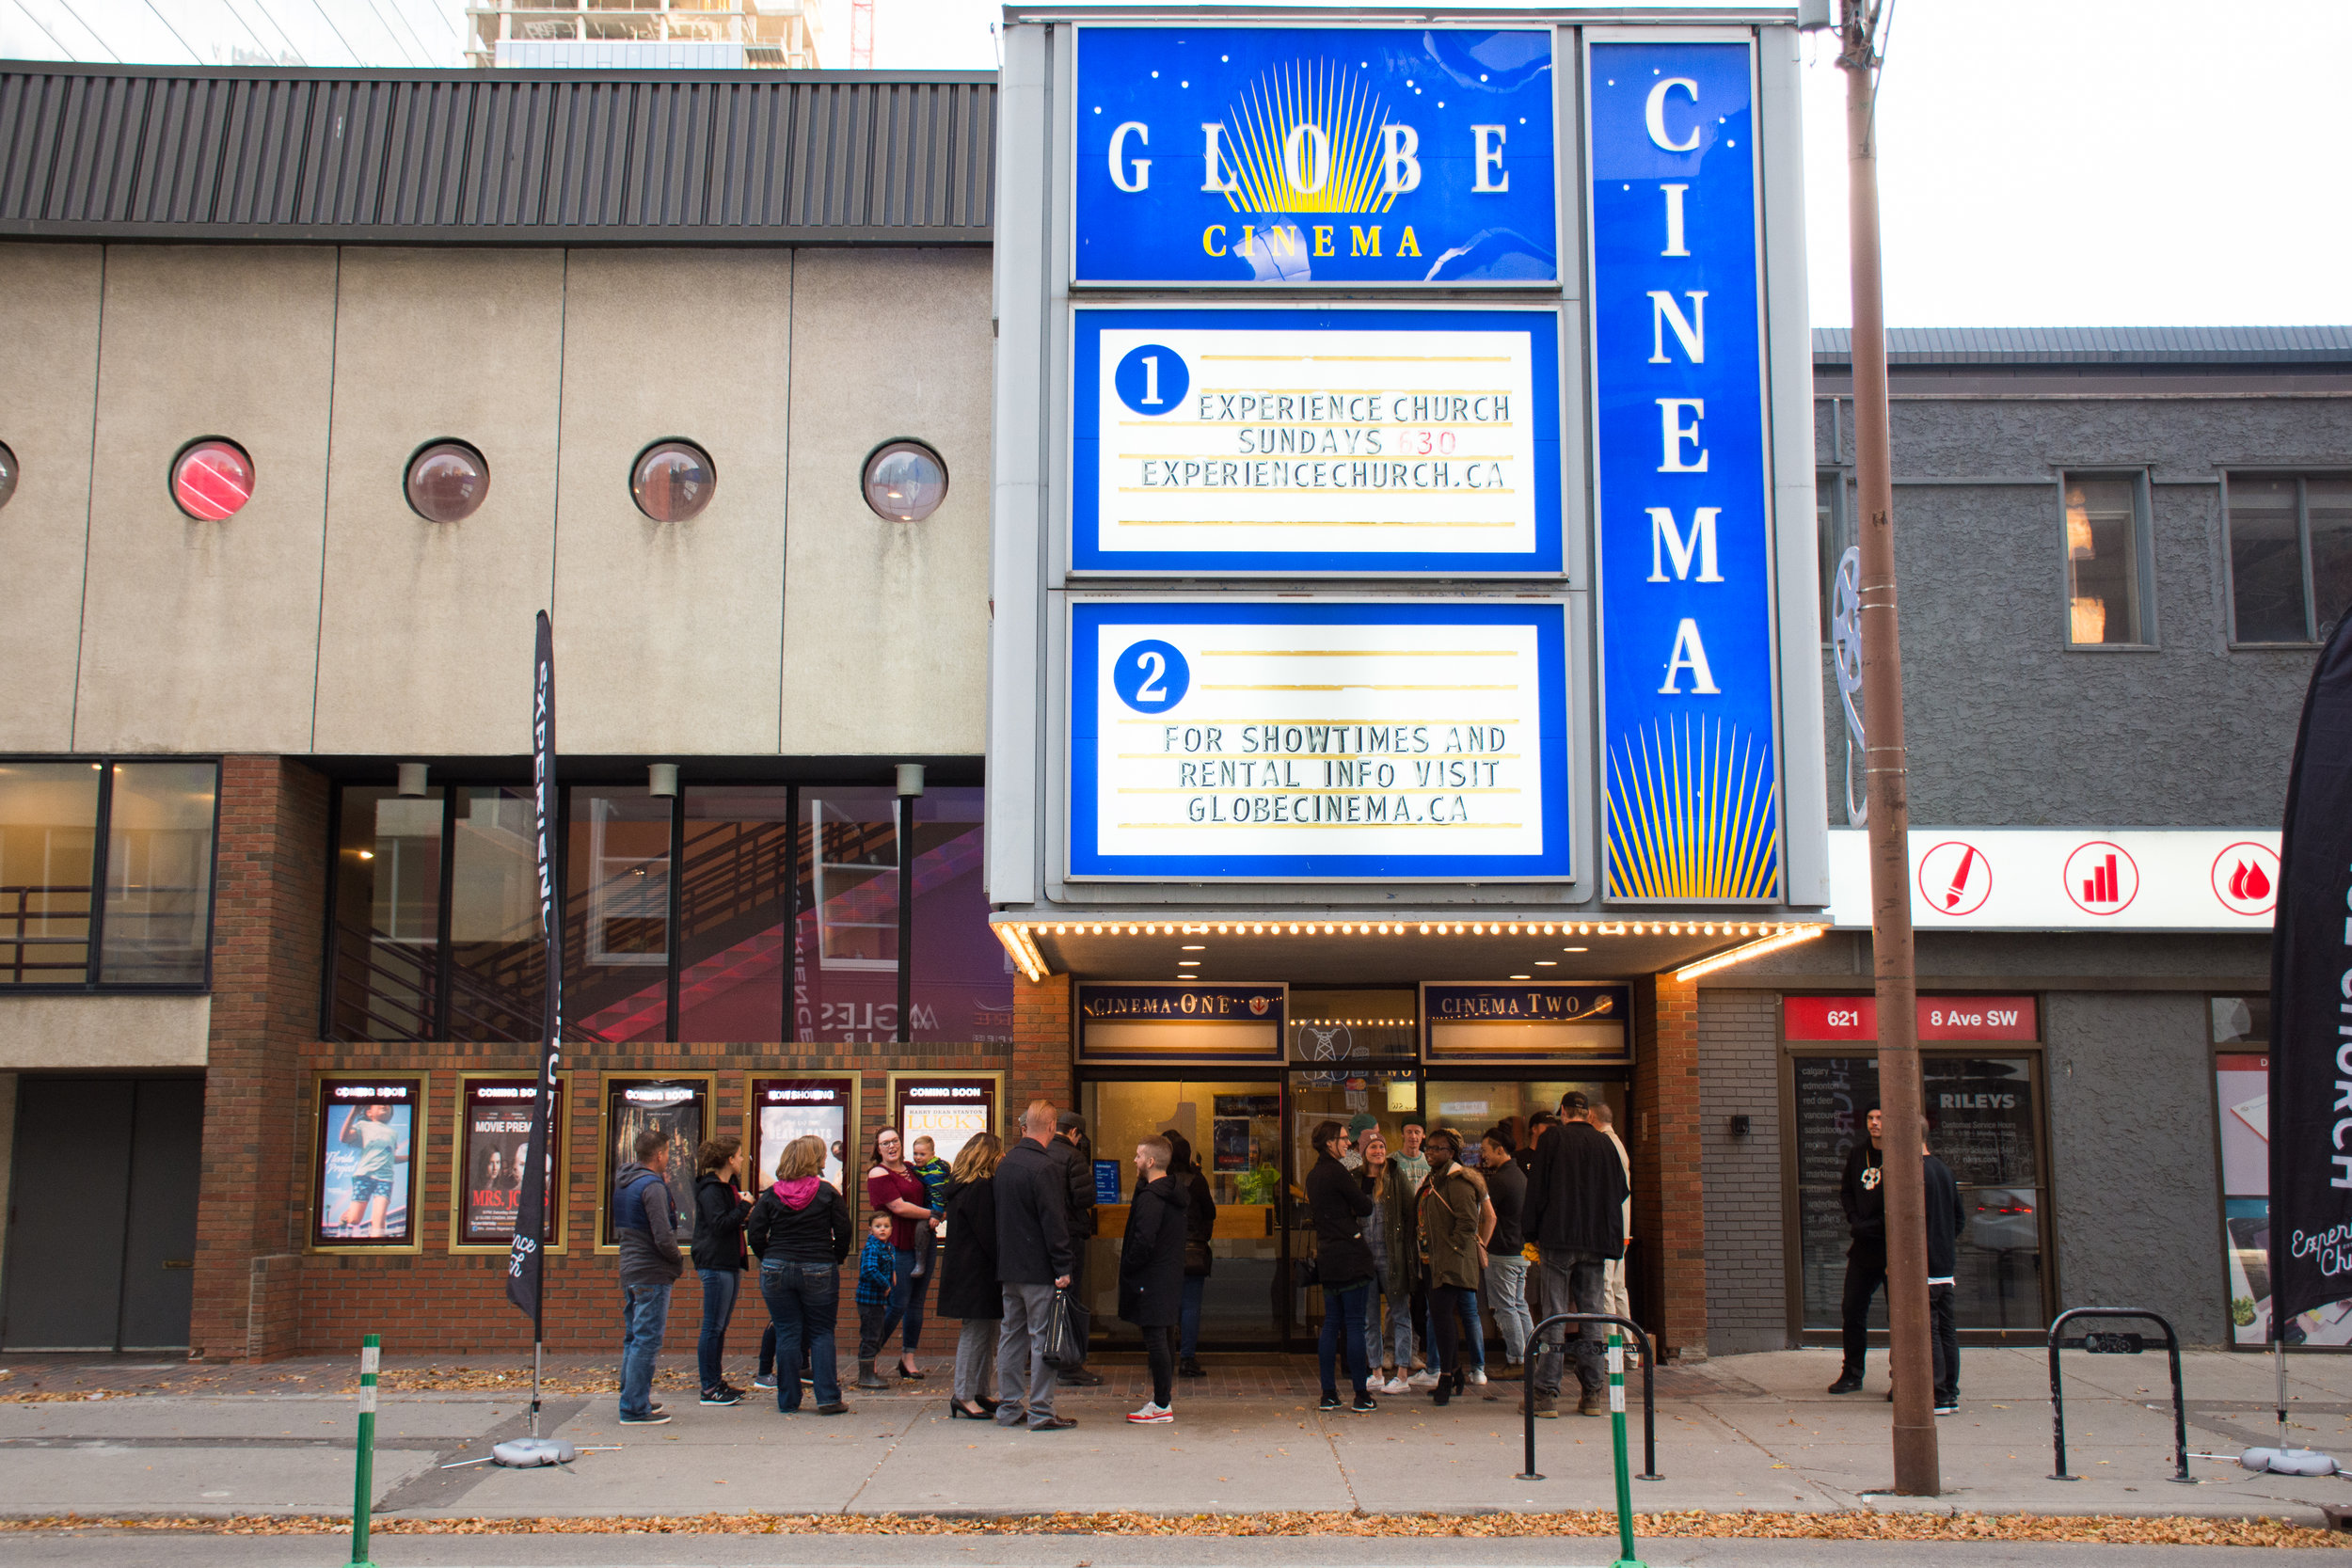 Globe Cinema - 617 8 Avenue SWCalgary, AB T2P 1H16:30pm